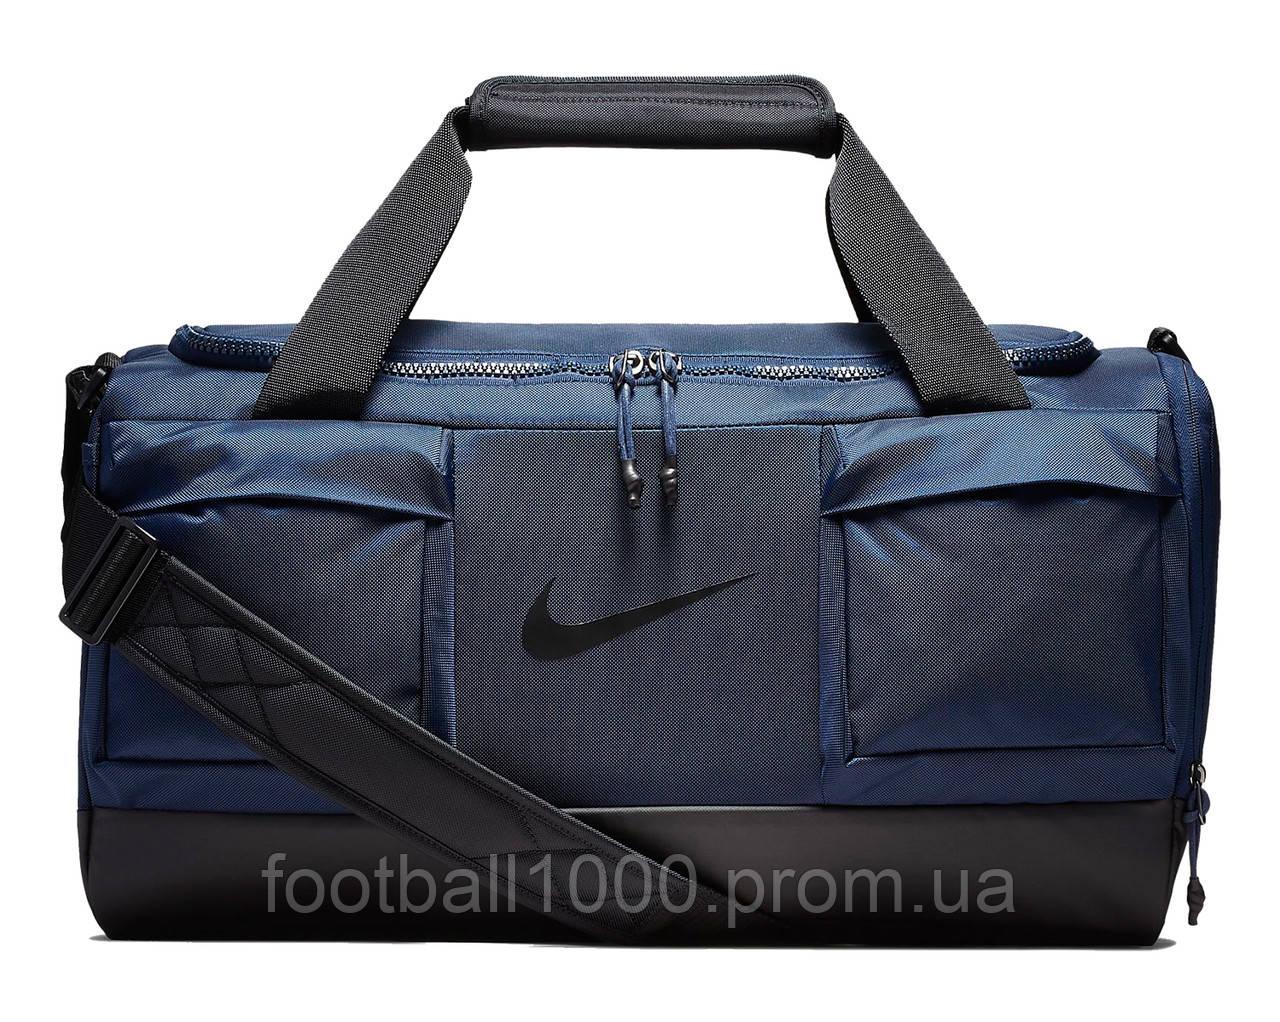 93ca2747 Спортивная сумка Nike Vapor Power Men's Training Duffel Bag (Small)  BA5543-410 -